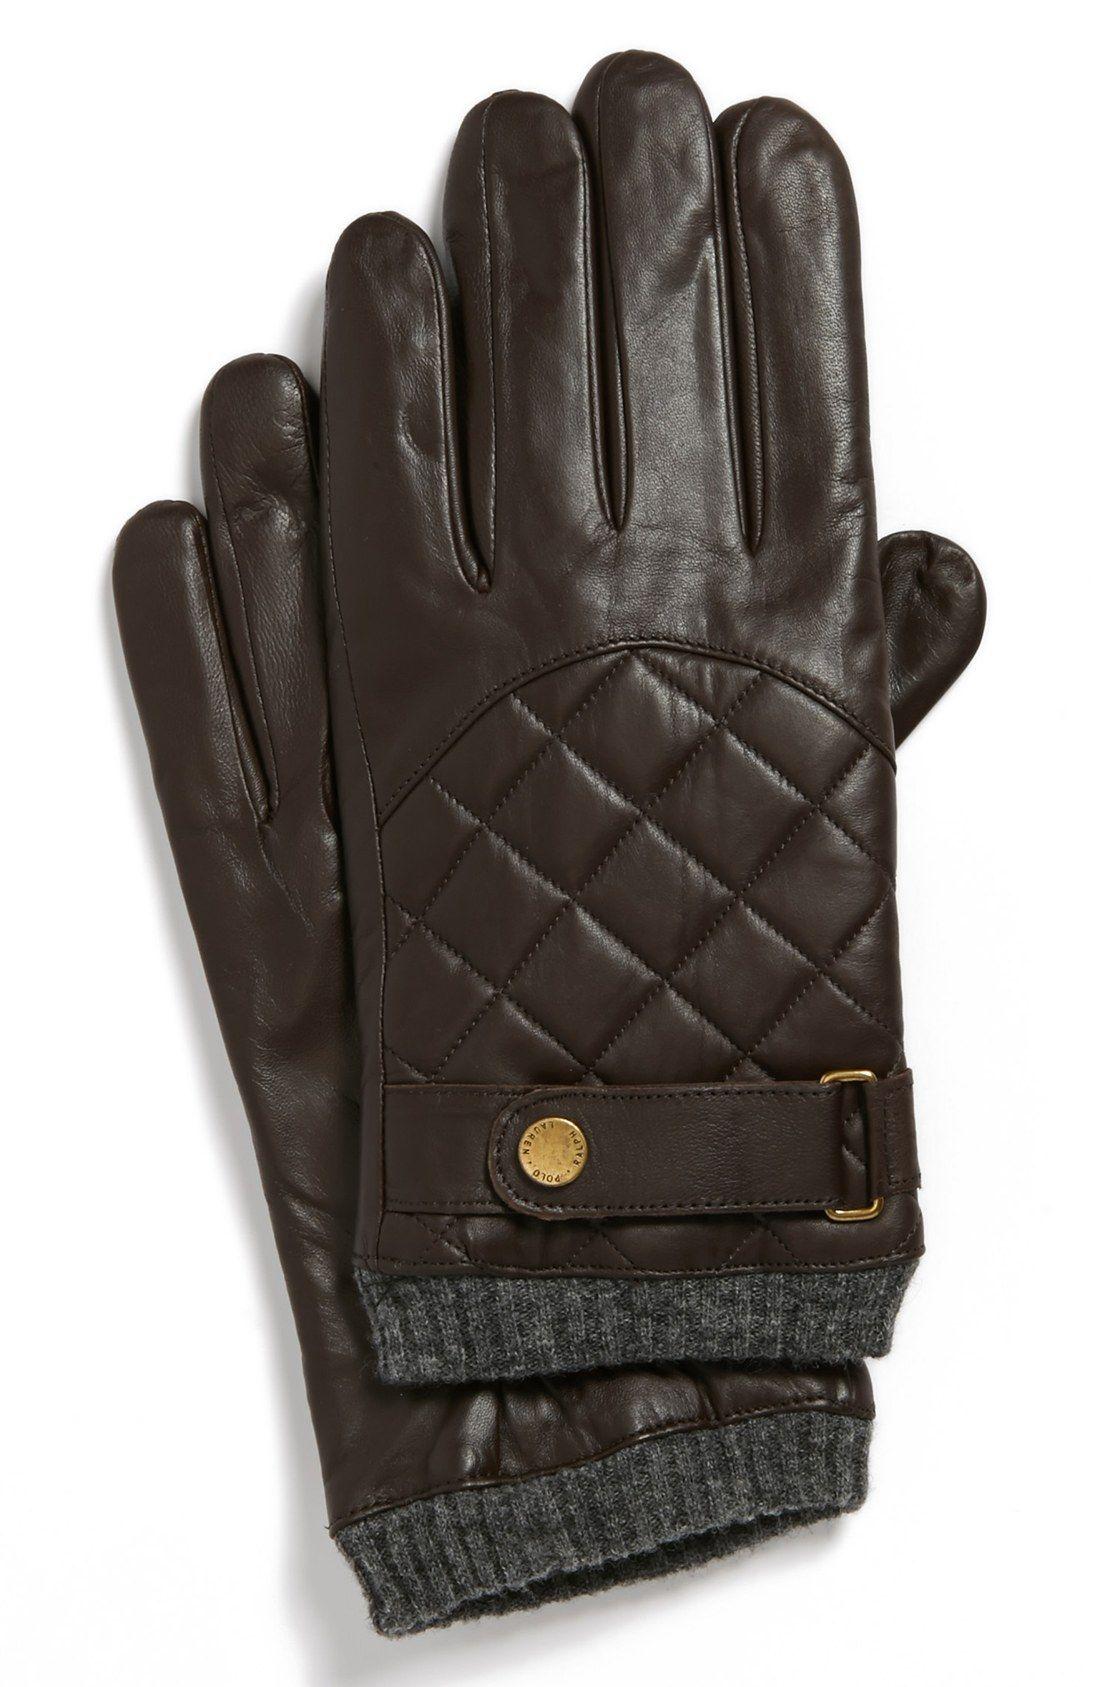 Winter essential for men | Ralph Lauren quilted gloves. | Winter ... : leather quilted gloves - Adamdwight.com